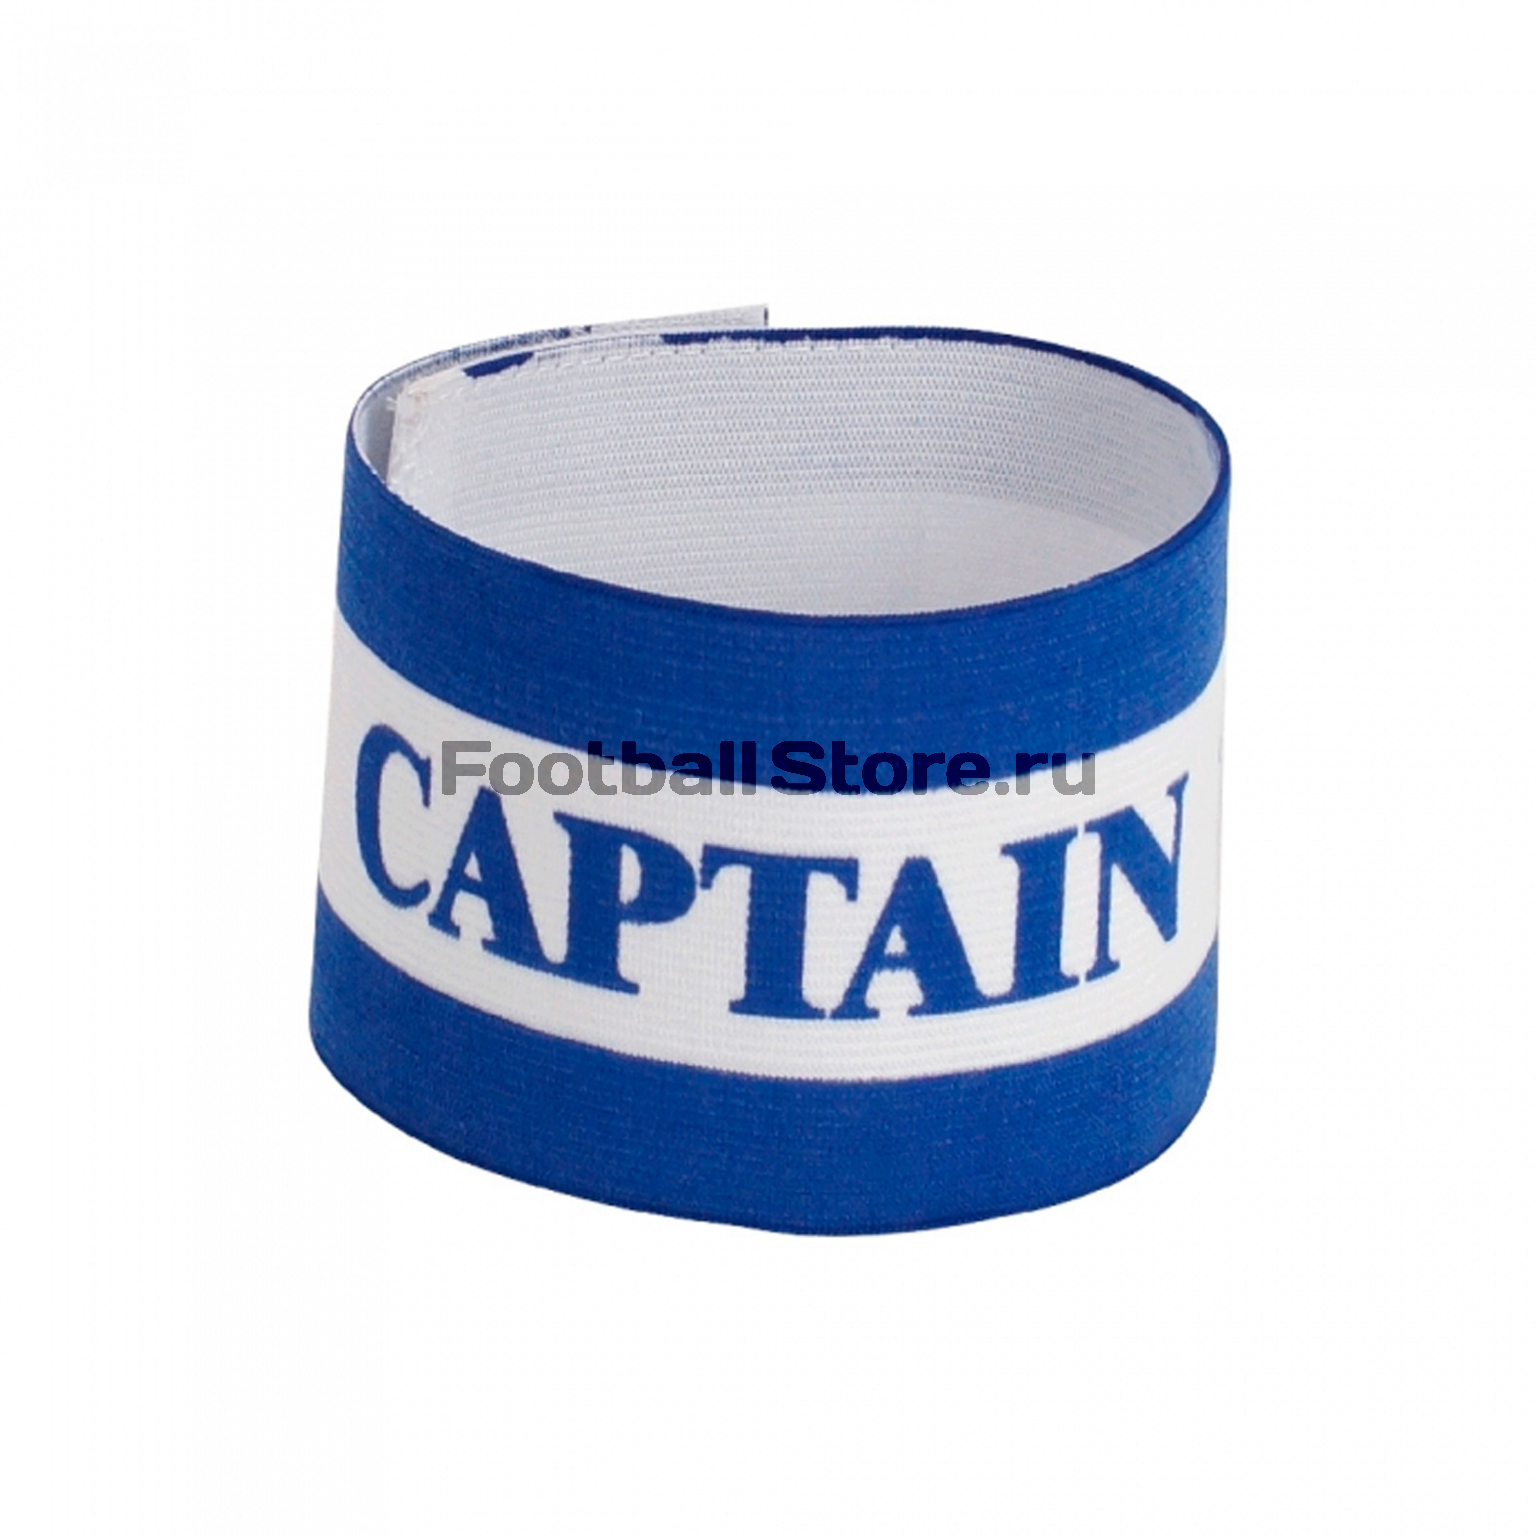 Повязки Umbro Капитанская повязка Select Captains Band 790920-555 капитанская повязка mitre a4029arf8